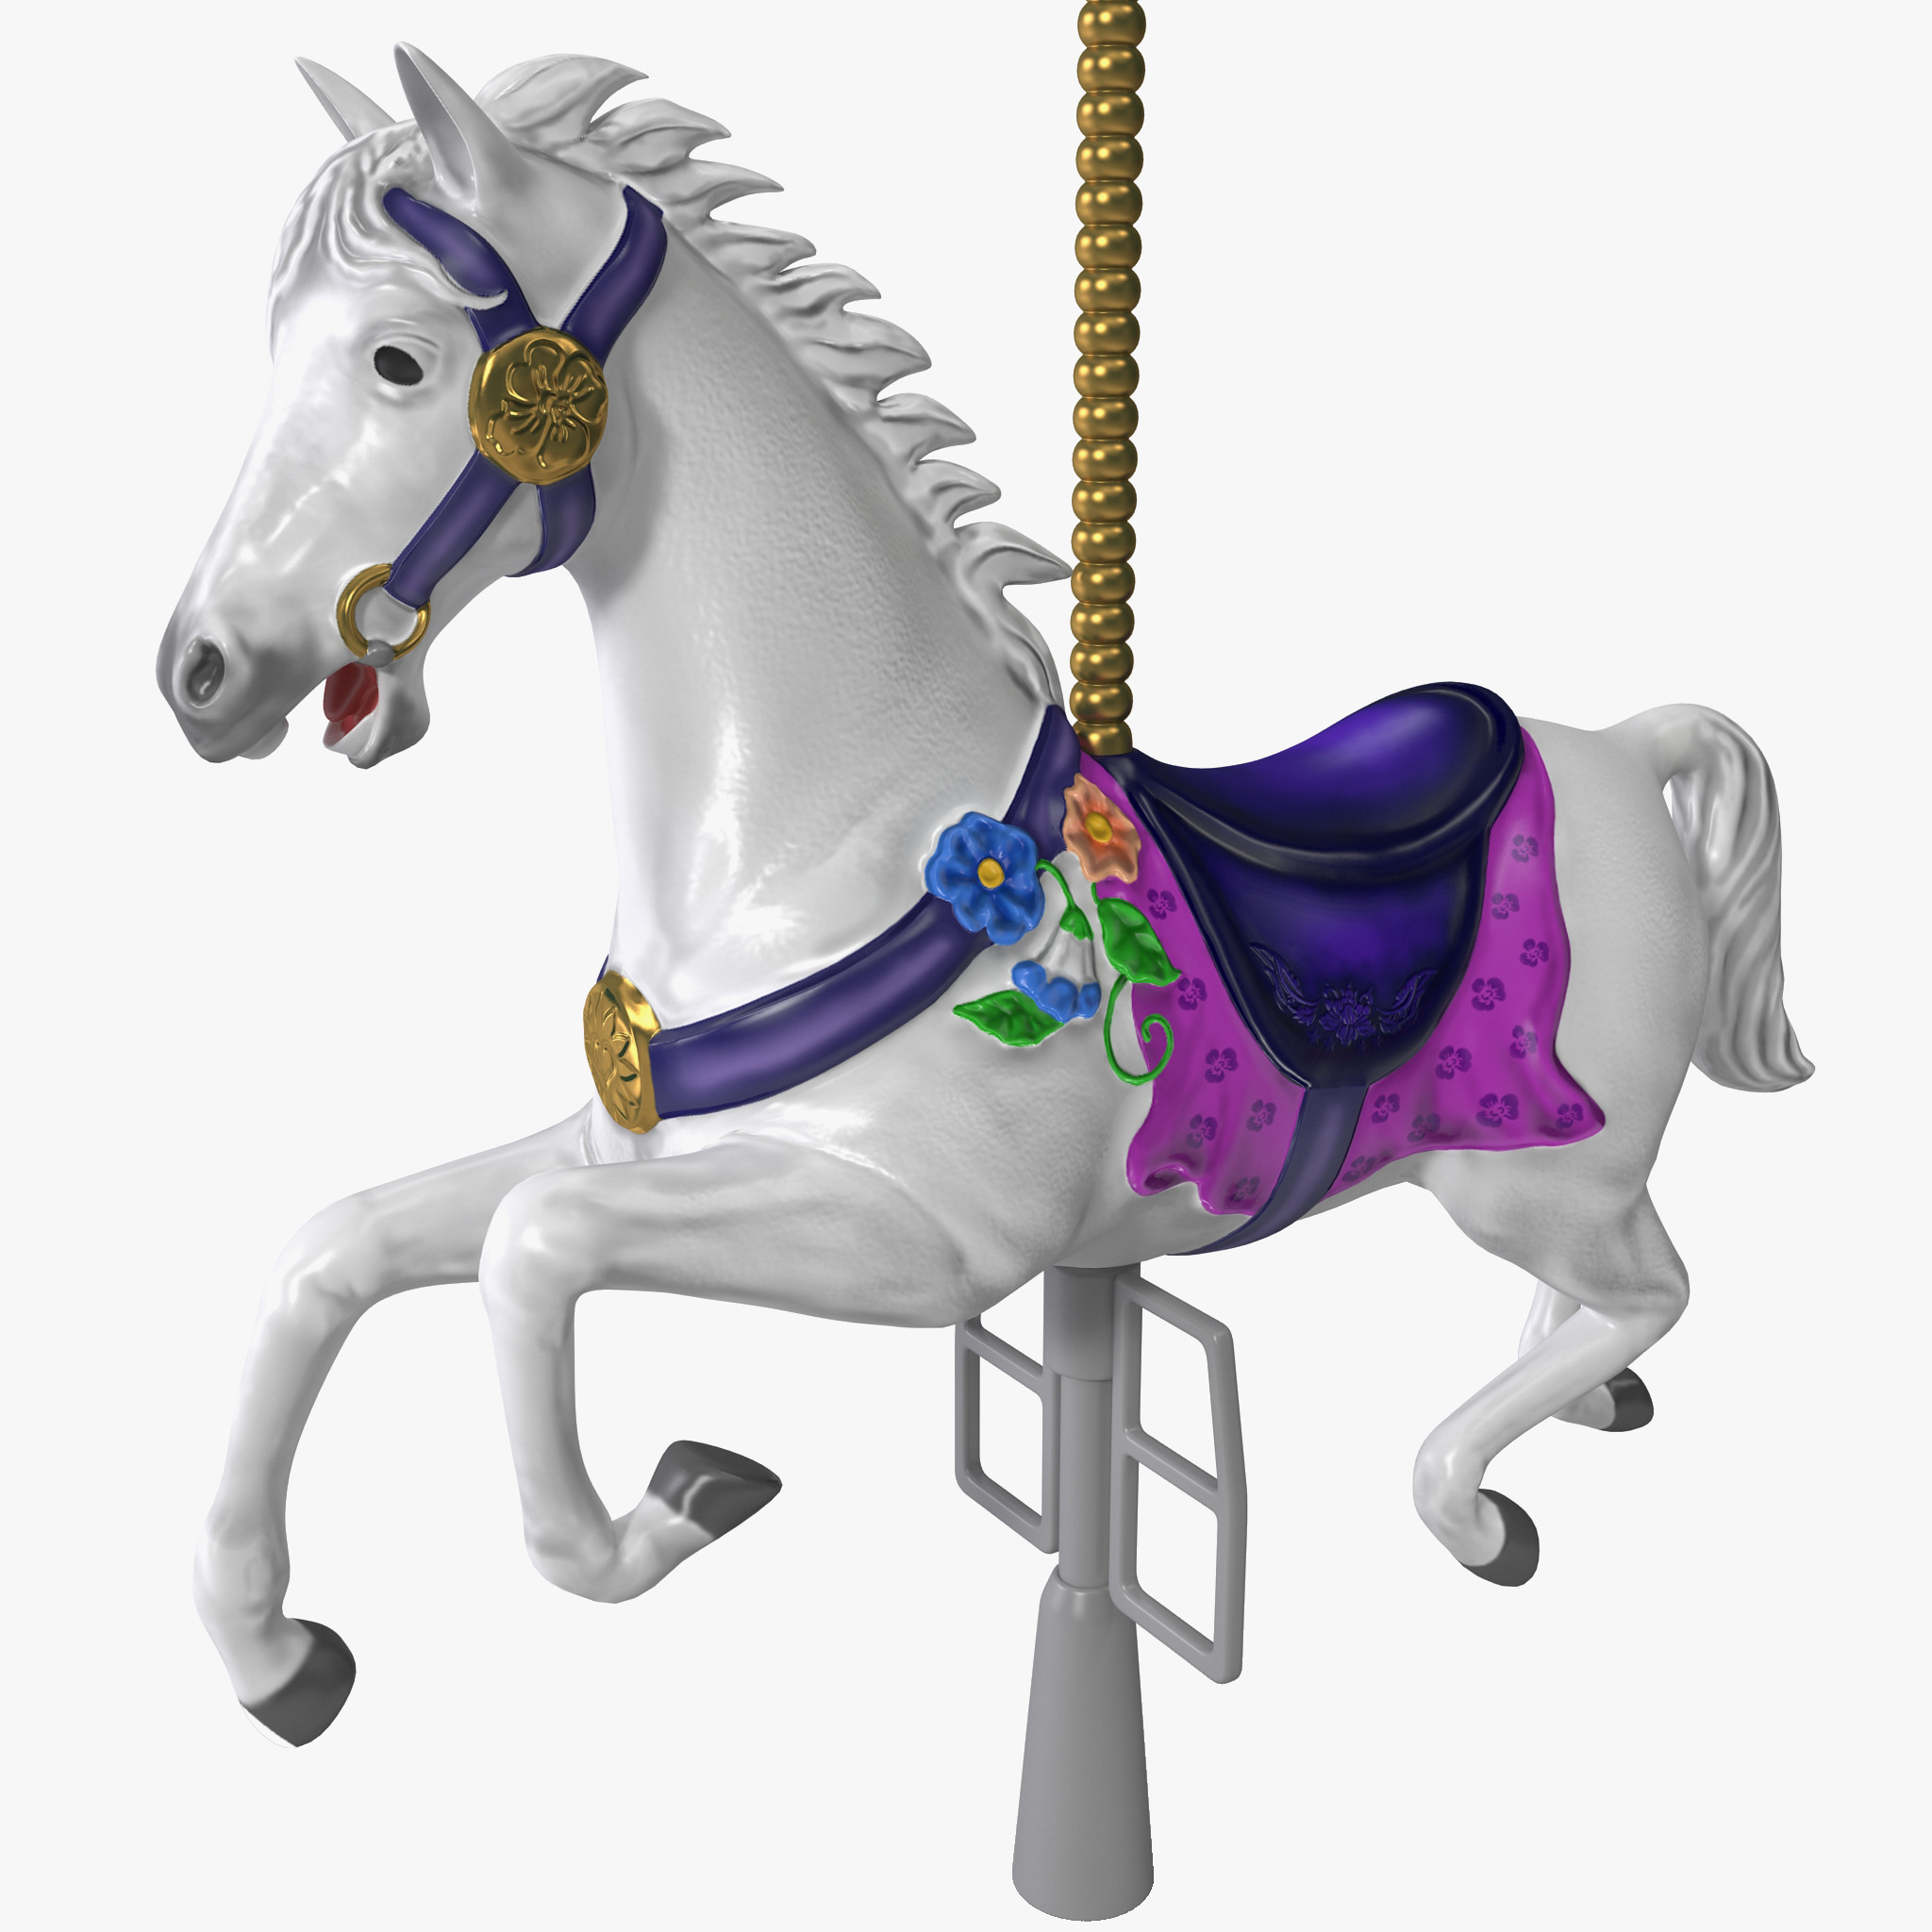 Carousel Horse_165.jpg